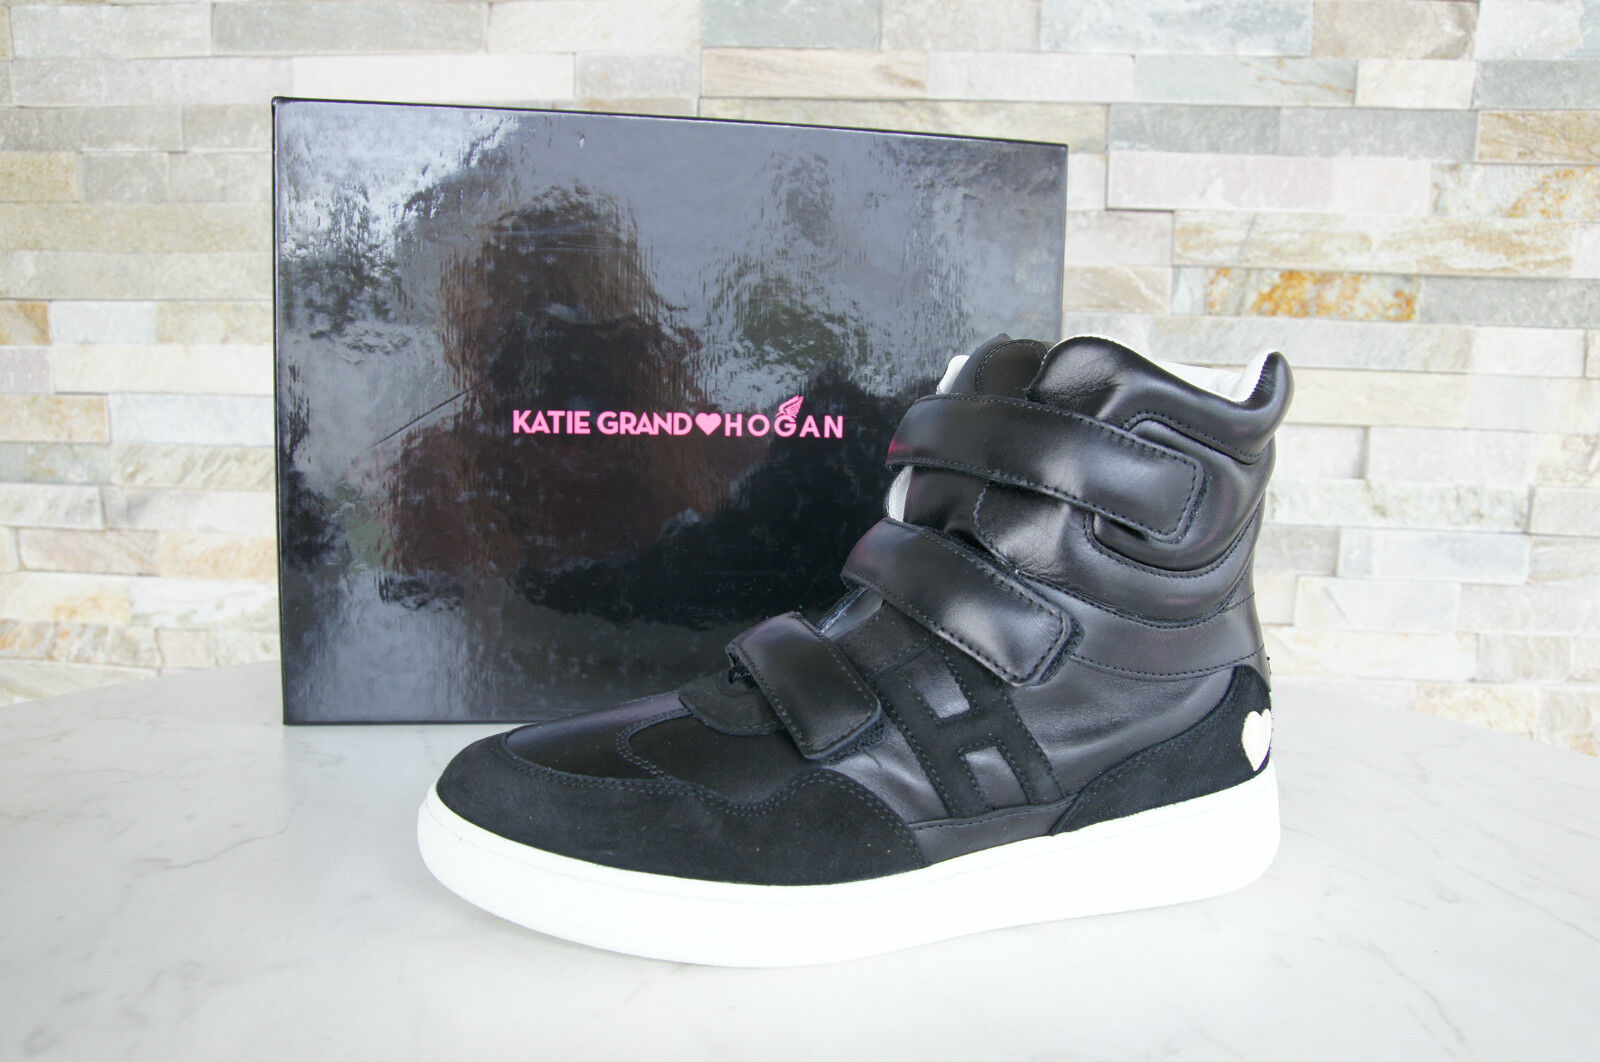 KATIE GRAND HOGAN Tods Tod´s Gr 38,5 NEU High-Top Sneakers schwarz schwarz NEU 38,5 aa9836